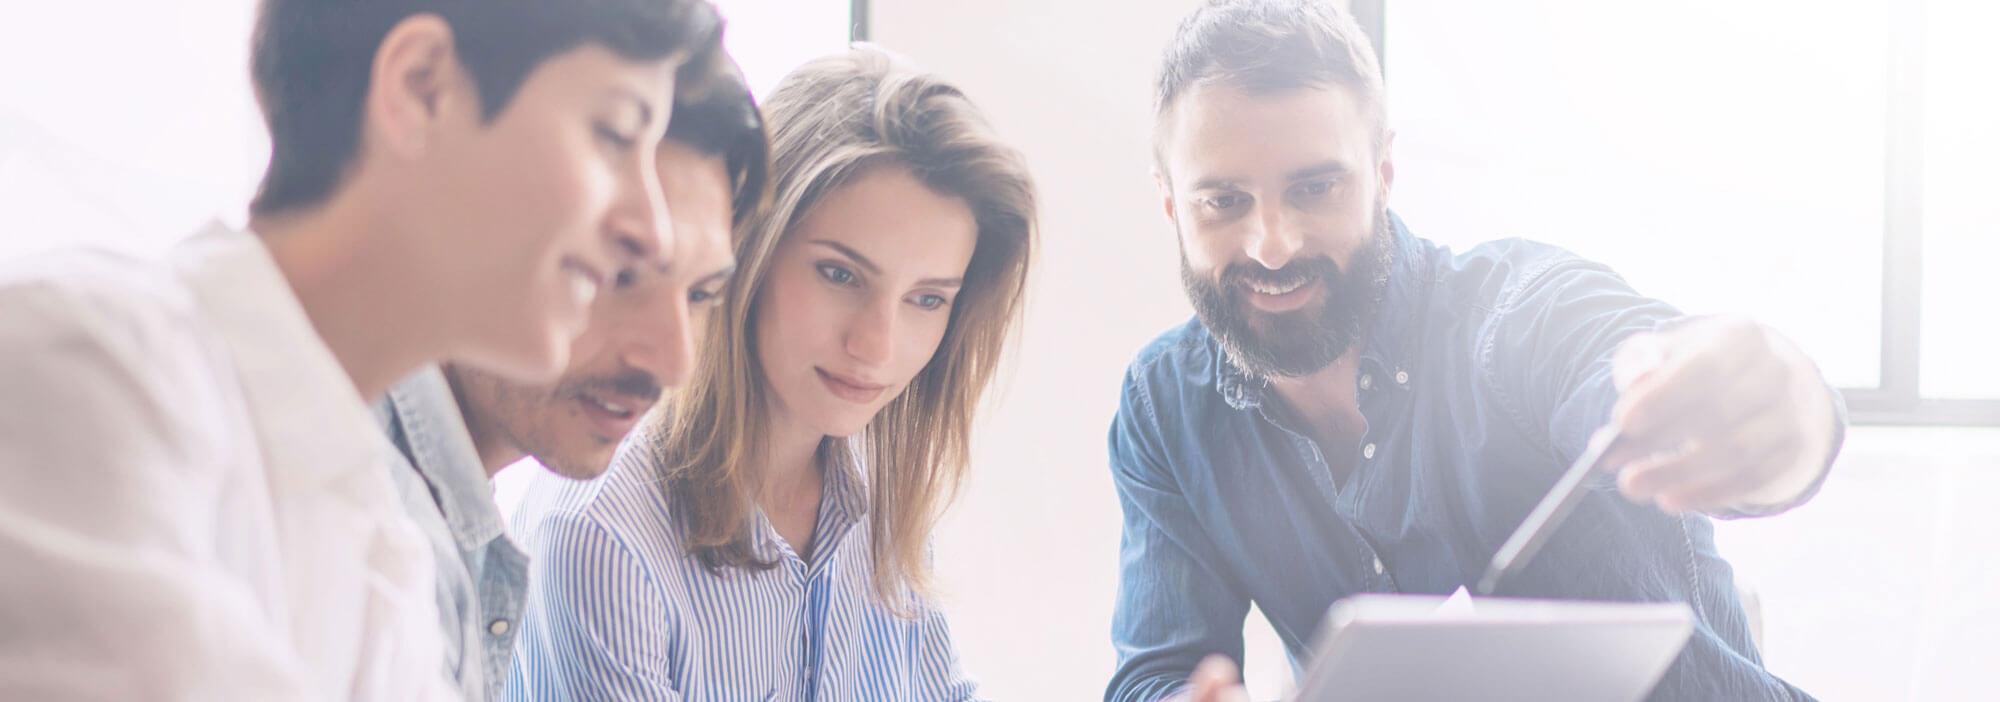 Karriereperspektiven & Stellenangebote